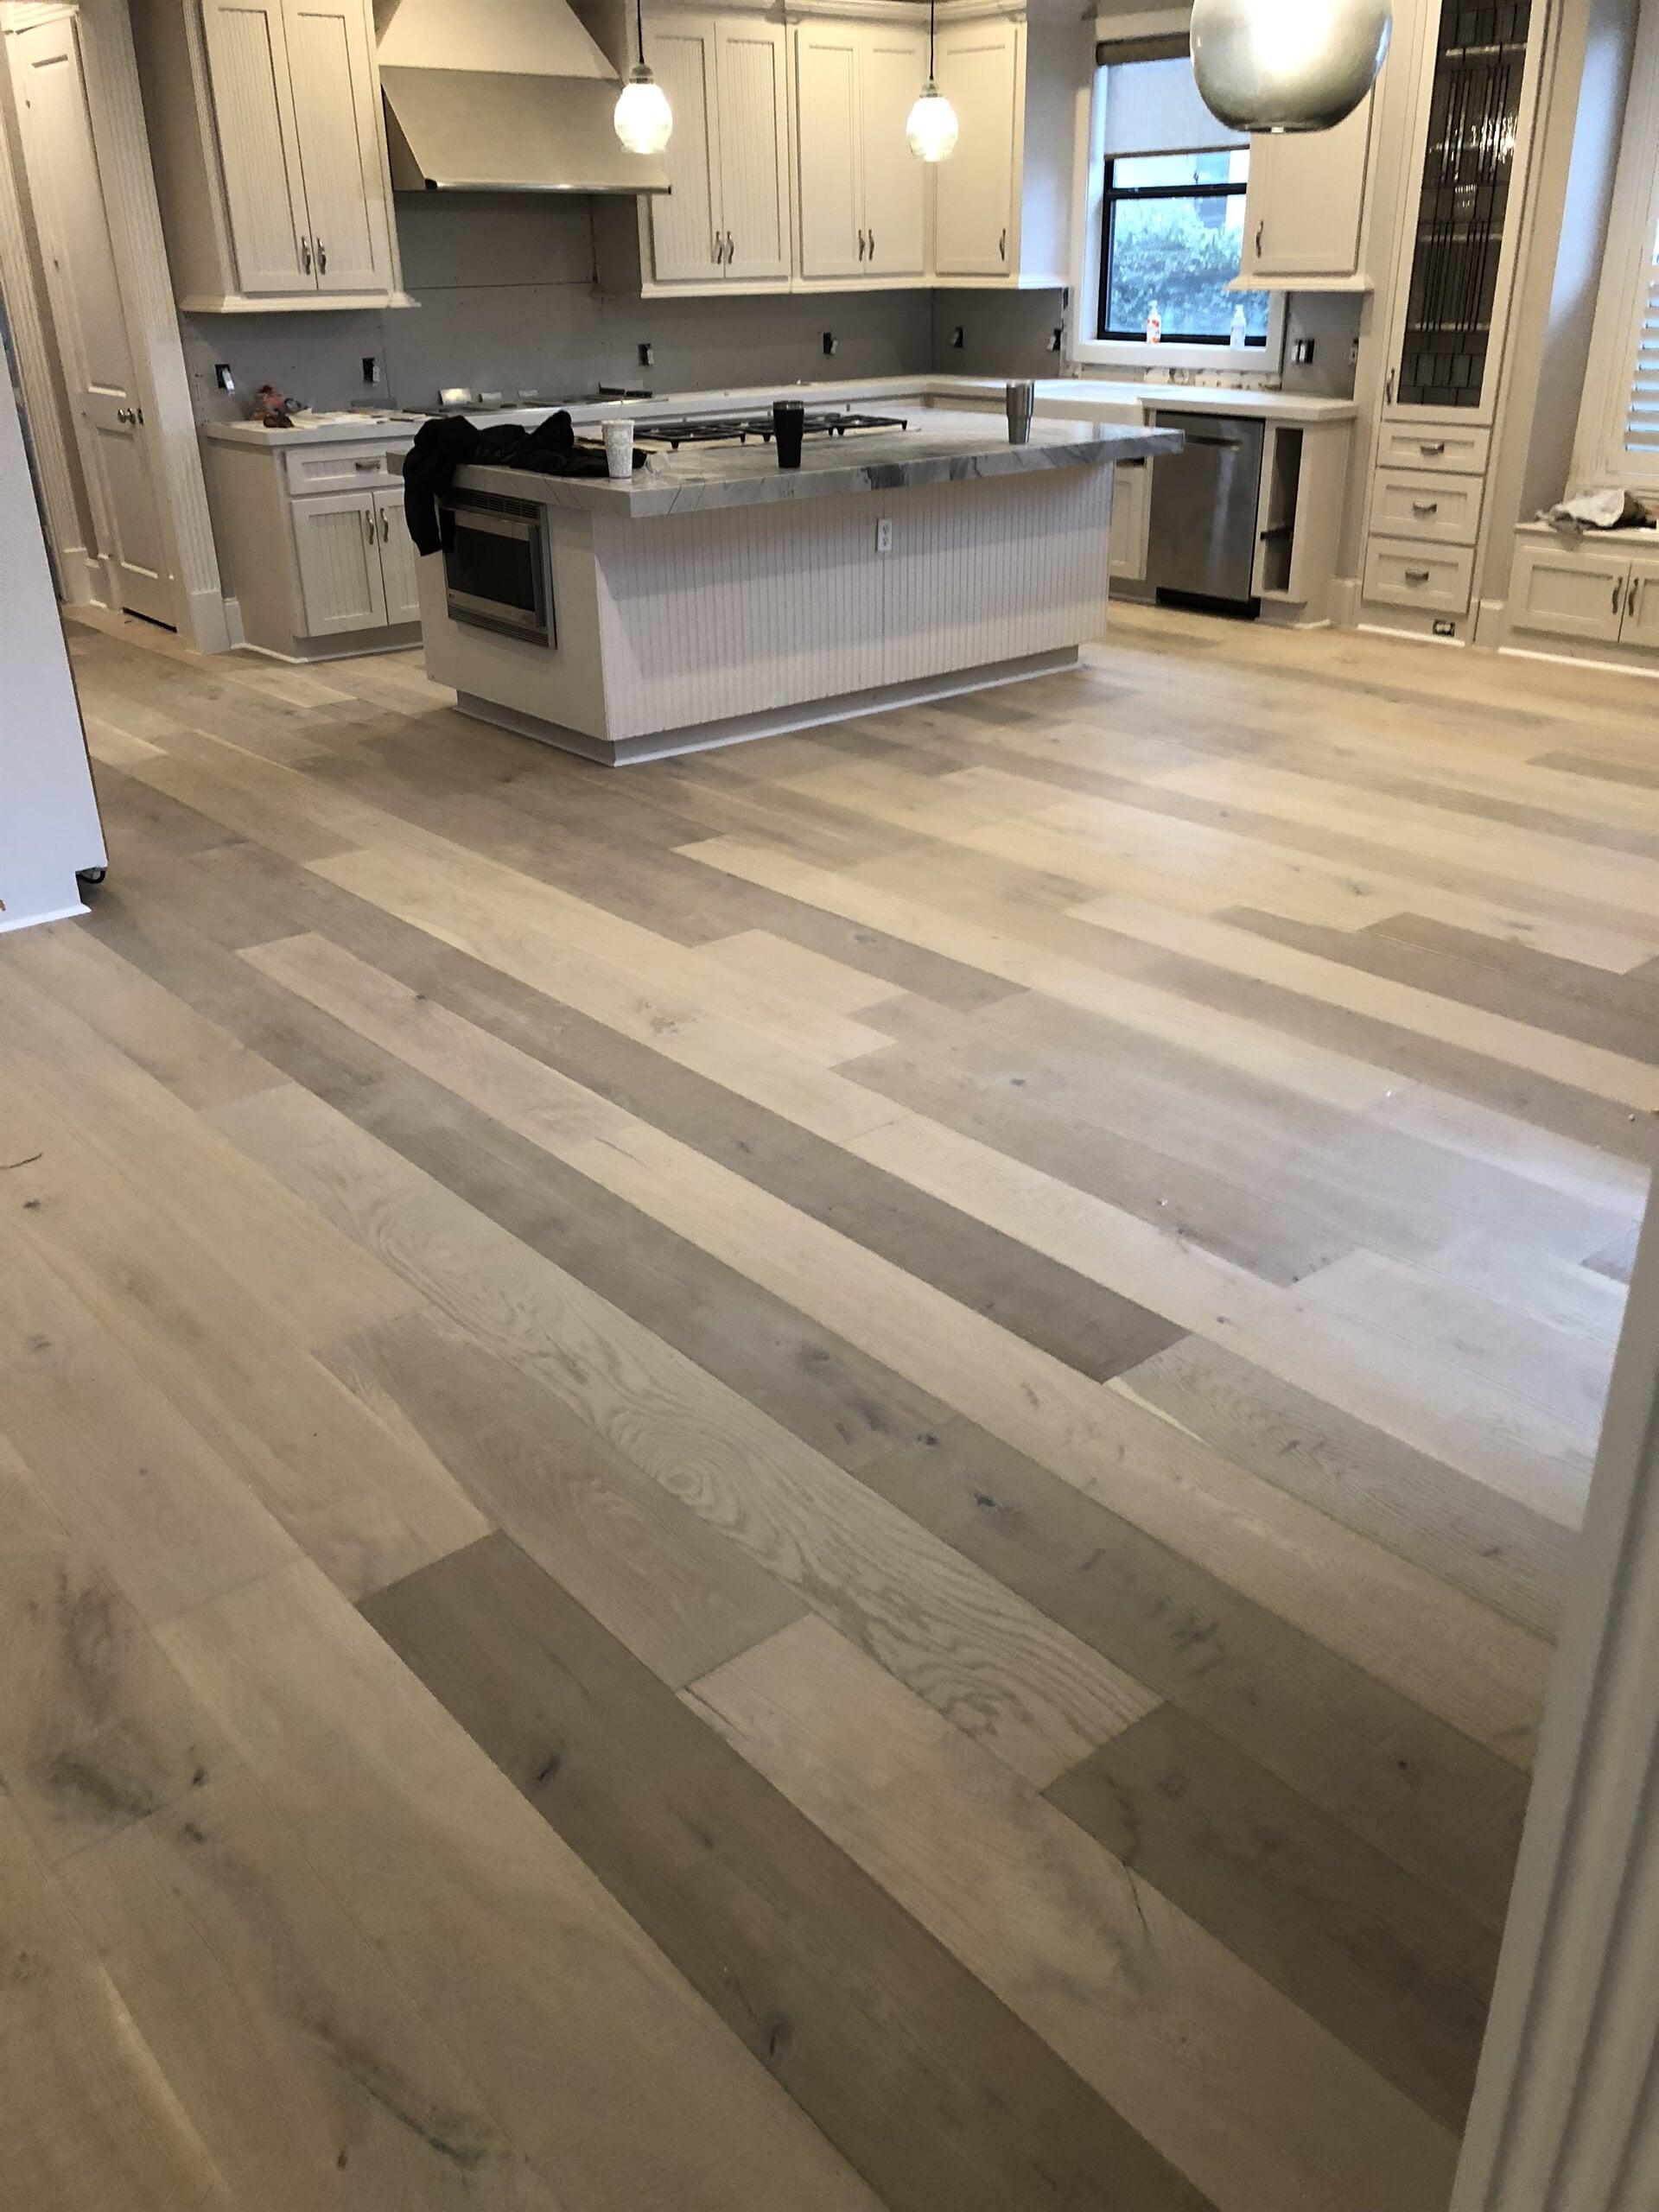 Engineered Hardwood flooring from Houston Floor Installation Services in Conroe, TX